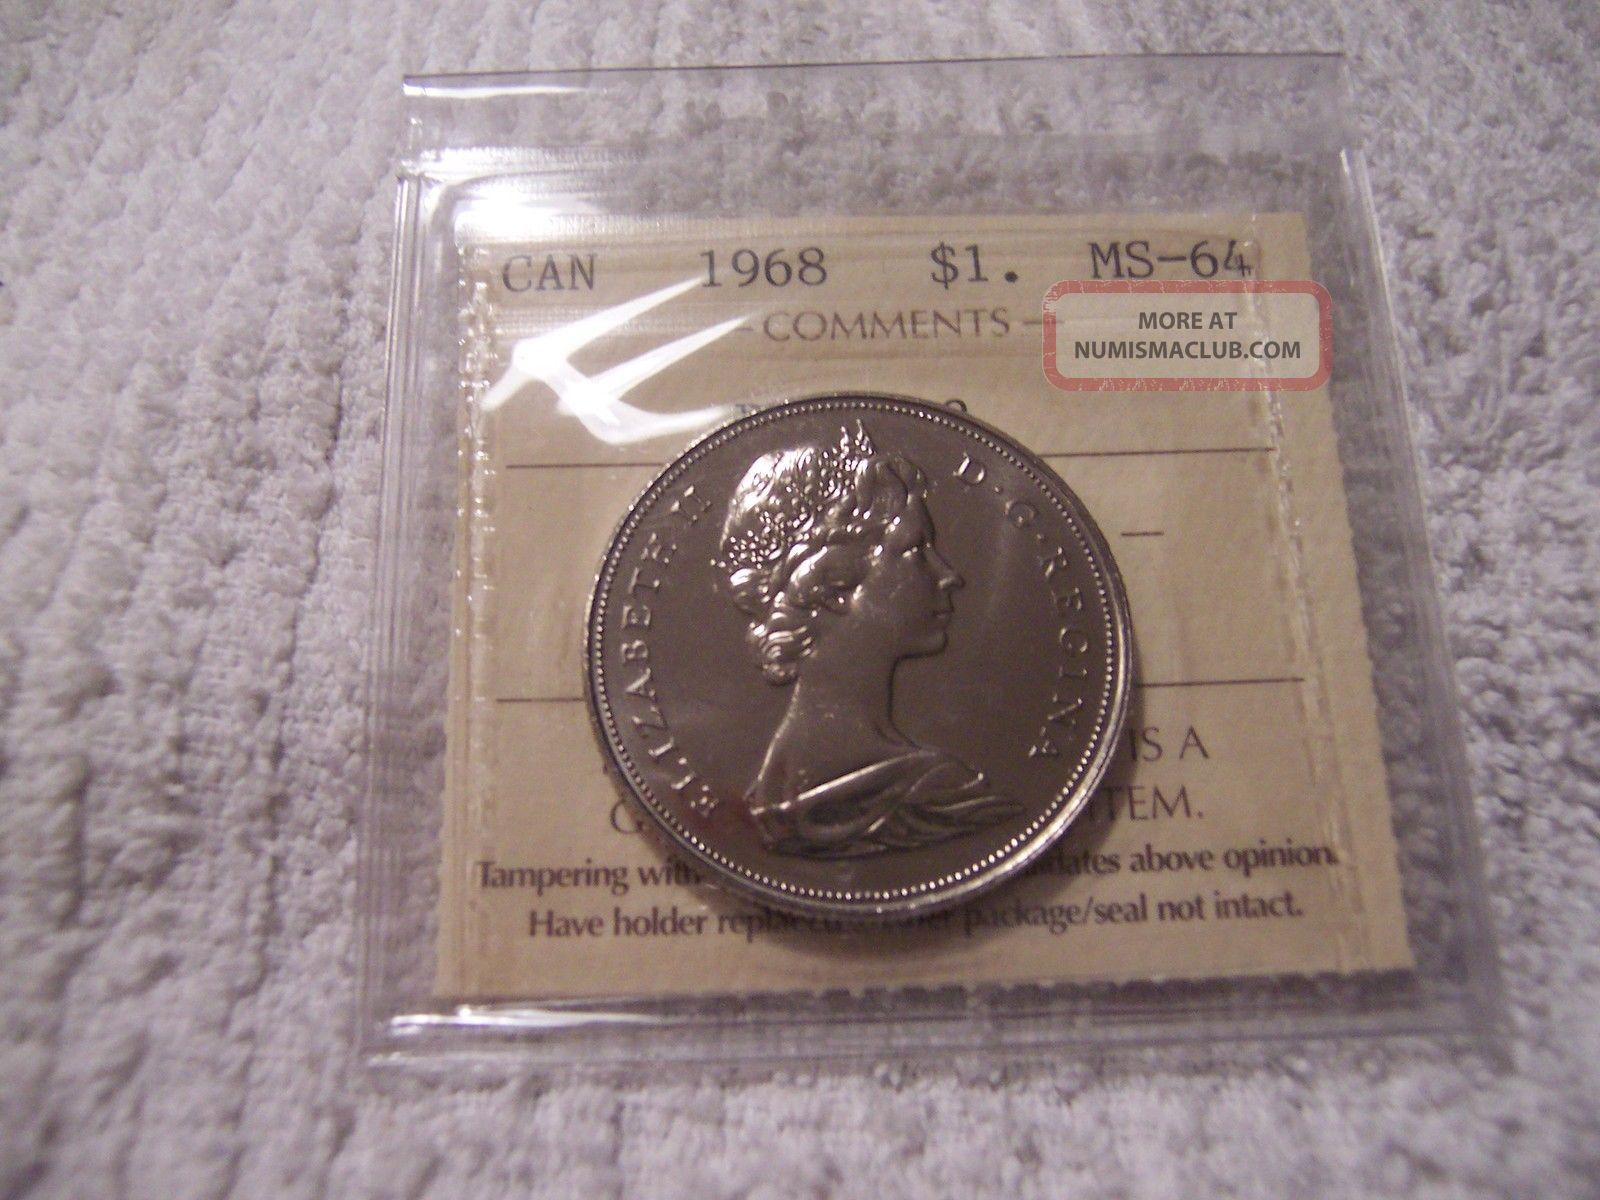 1968 Canada Dollar Dhl 2 Ms - 64 Coins: Canada photo